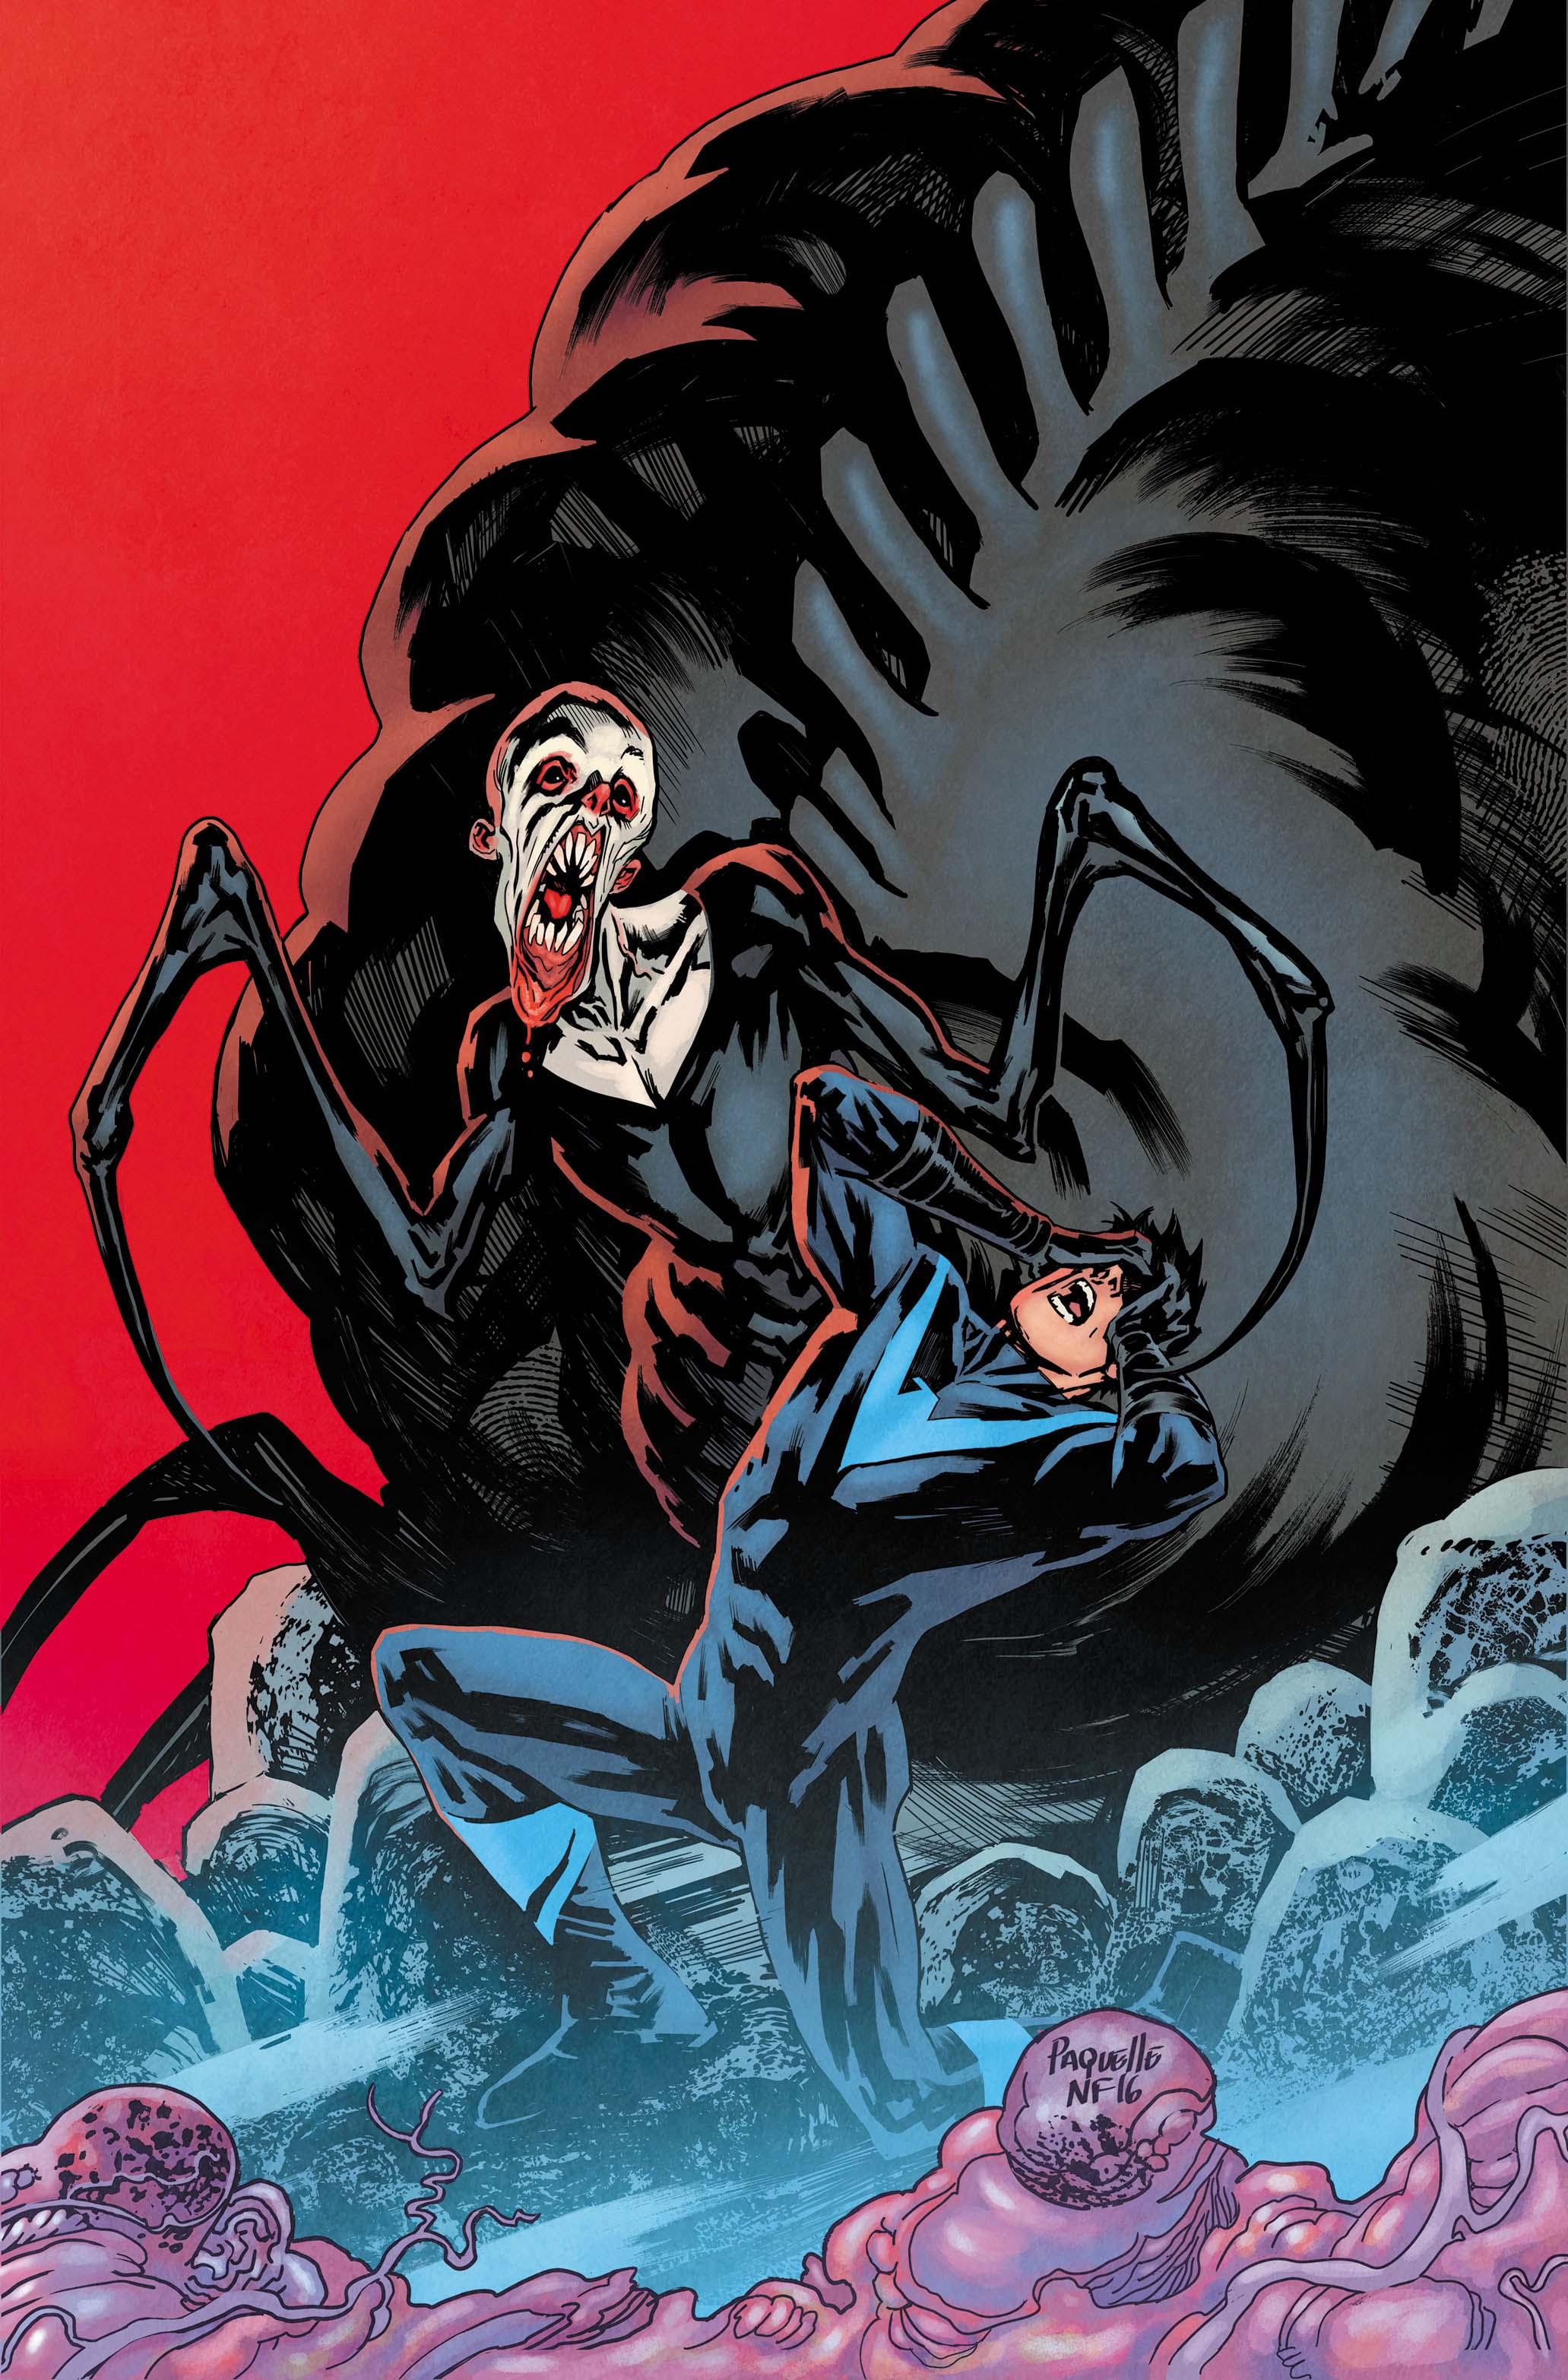 Nightwing #5